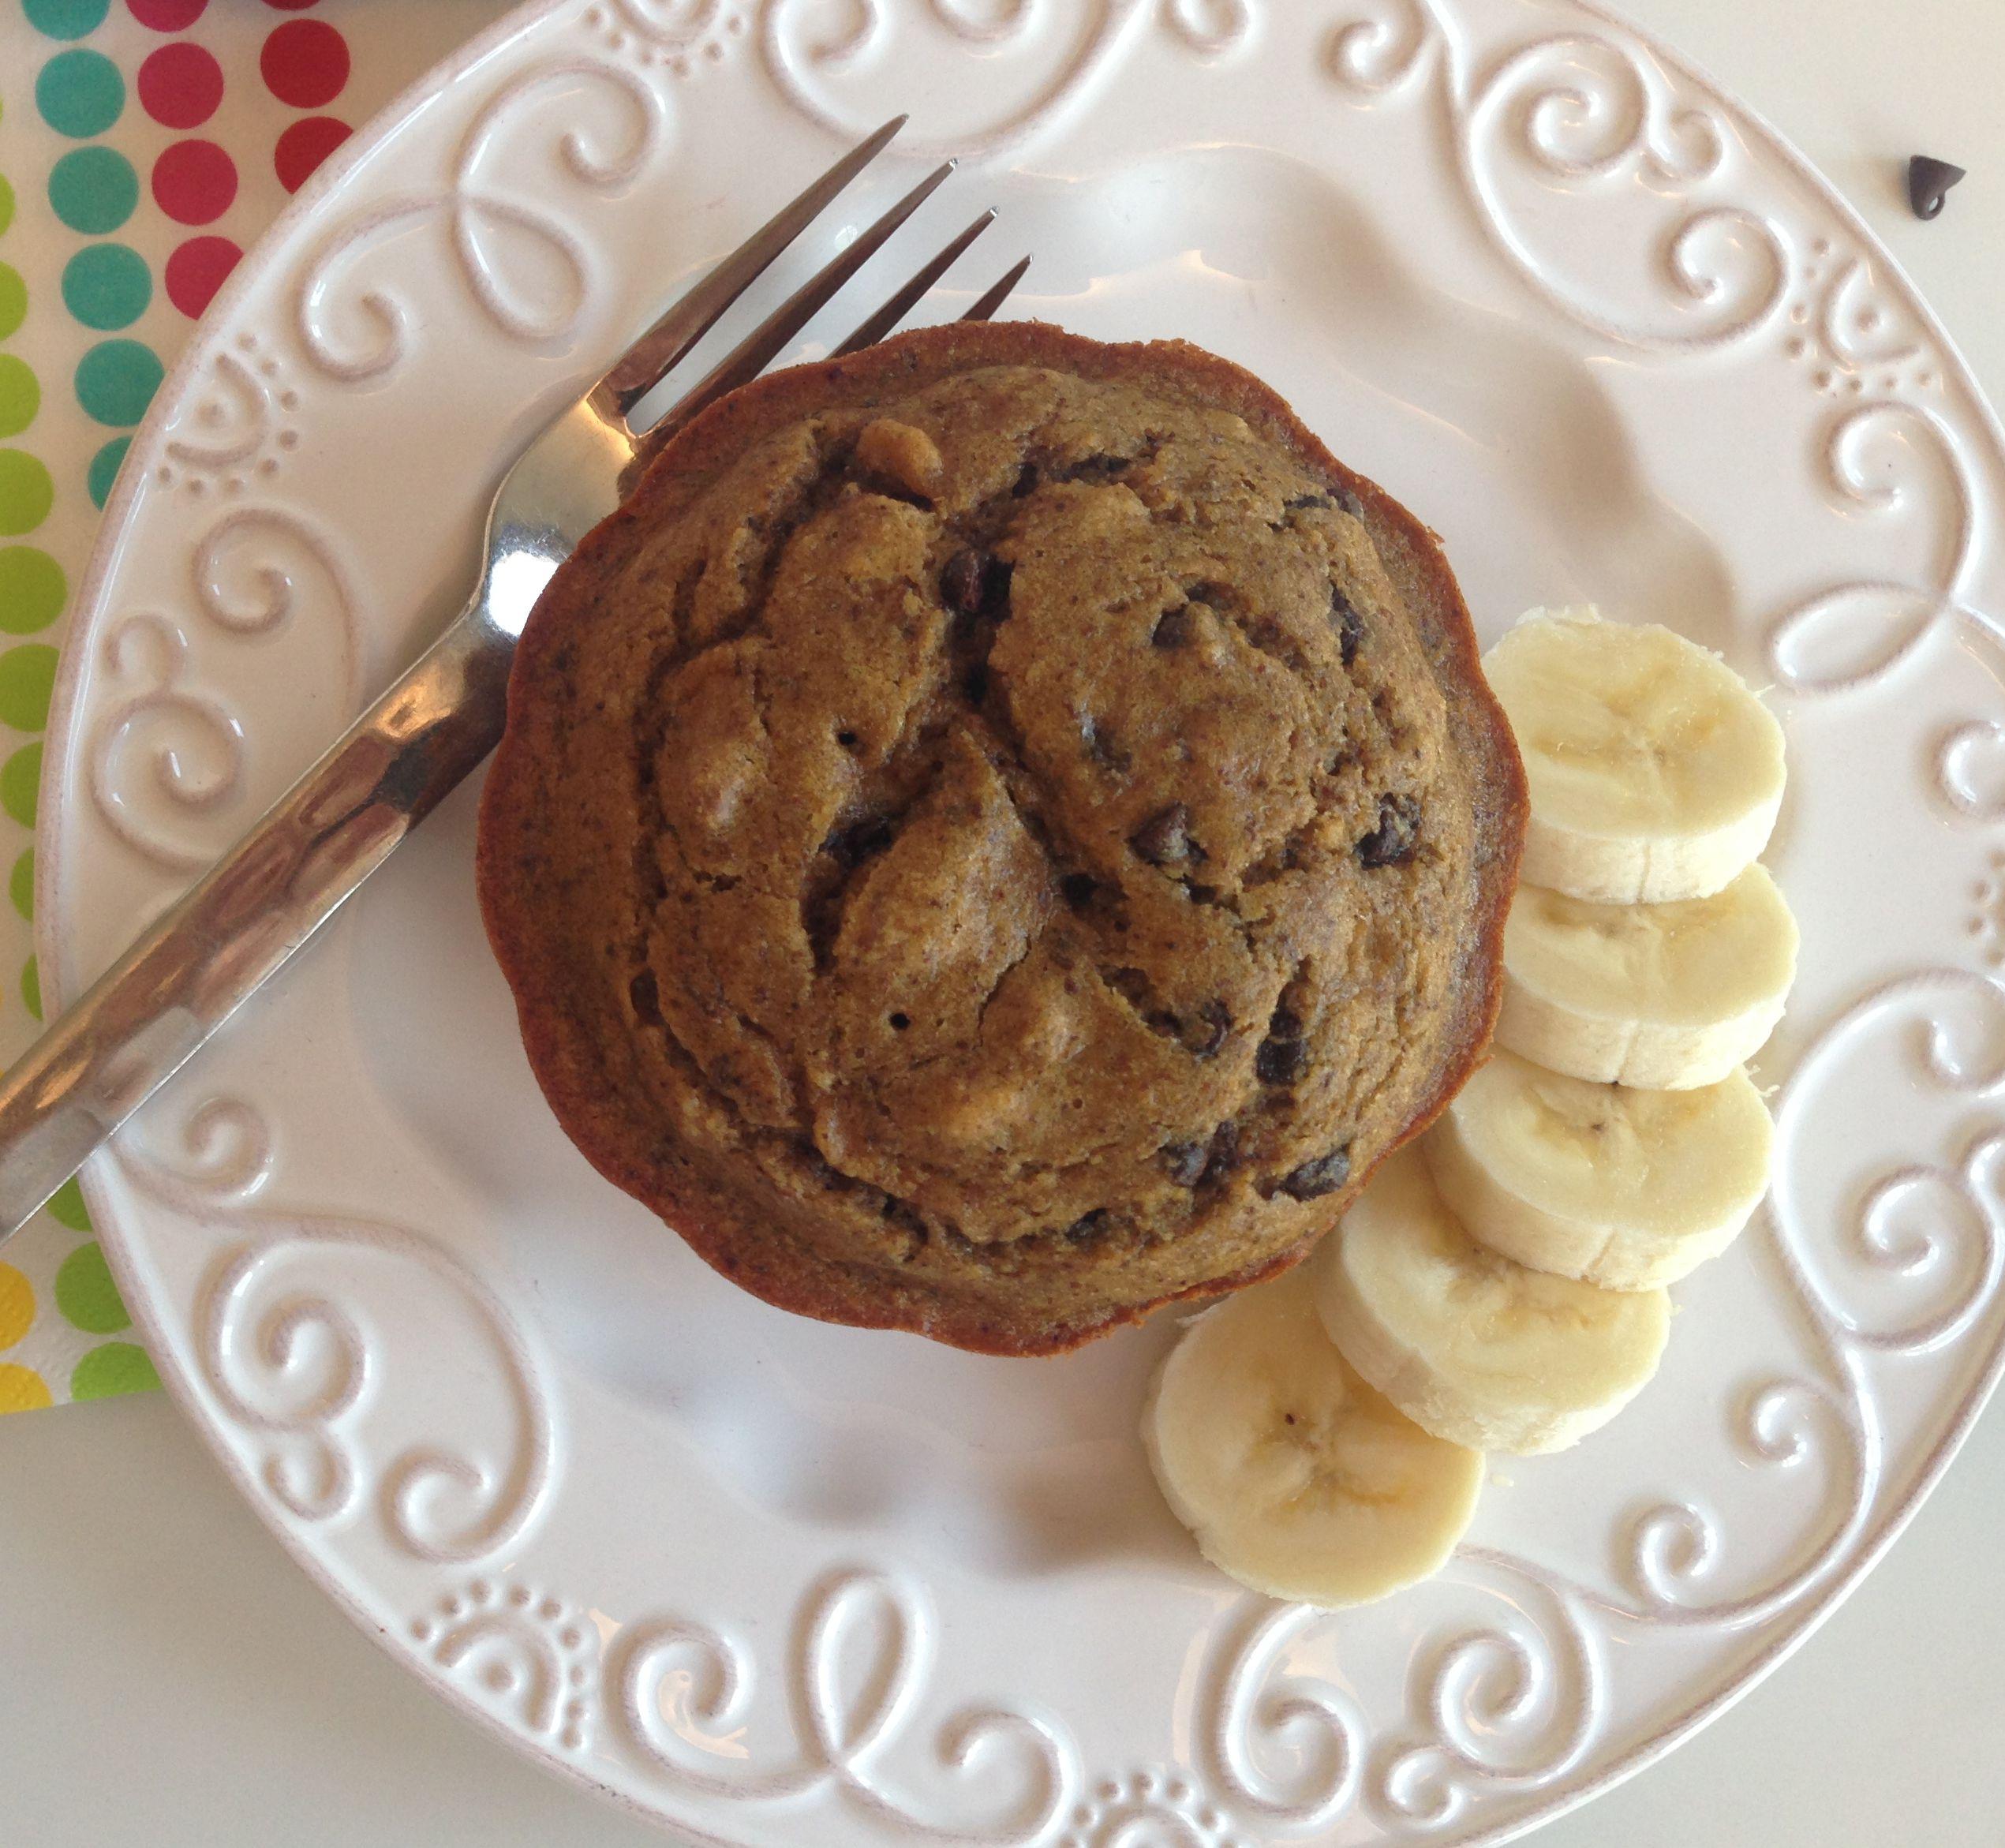 Chocolate Chip Banana Bundt Cake